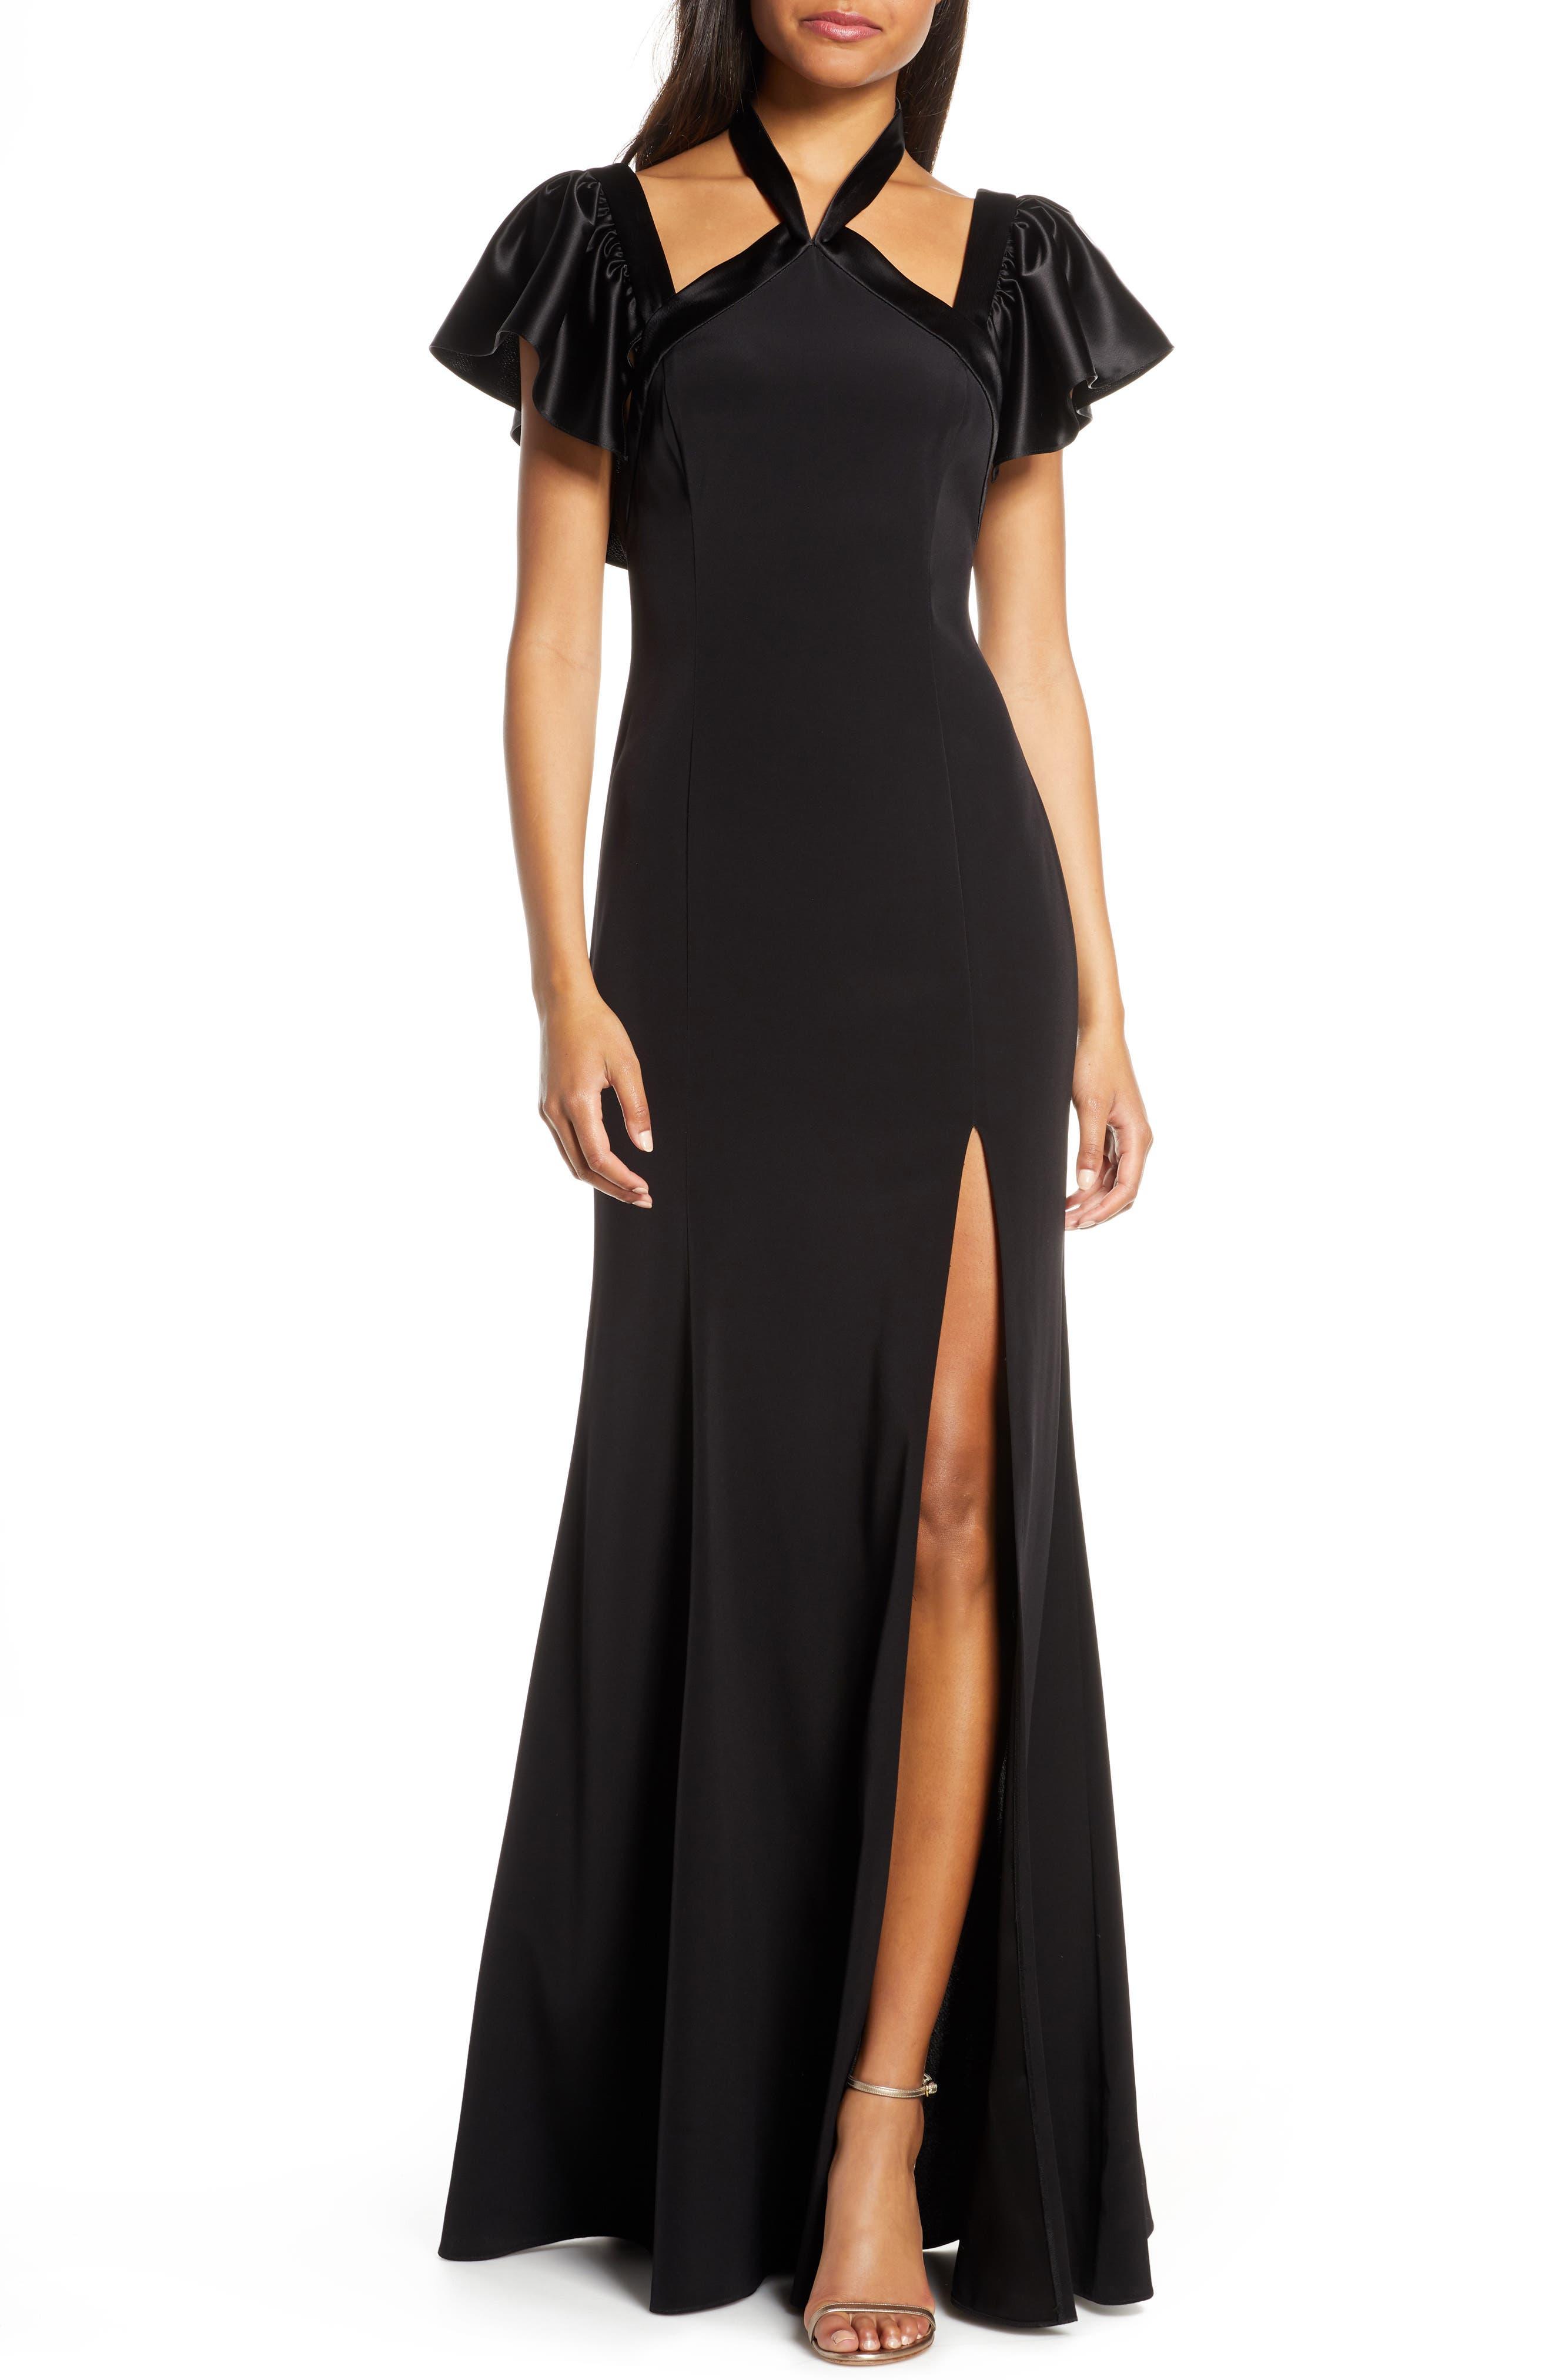 Jill Jill Stuart Crepe Back Satin Halter Neck Evening Gown, Black